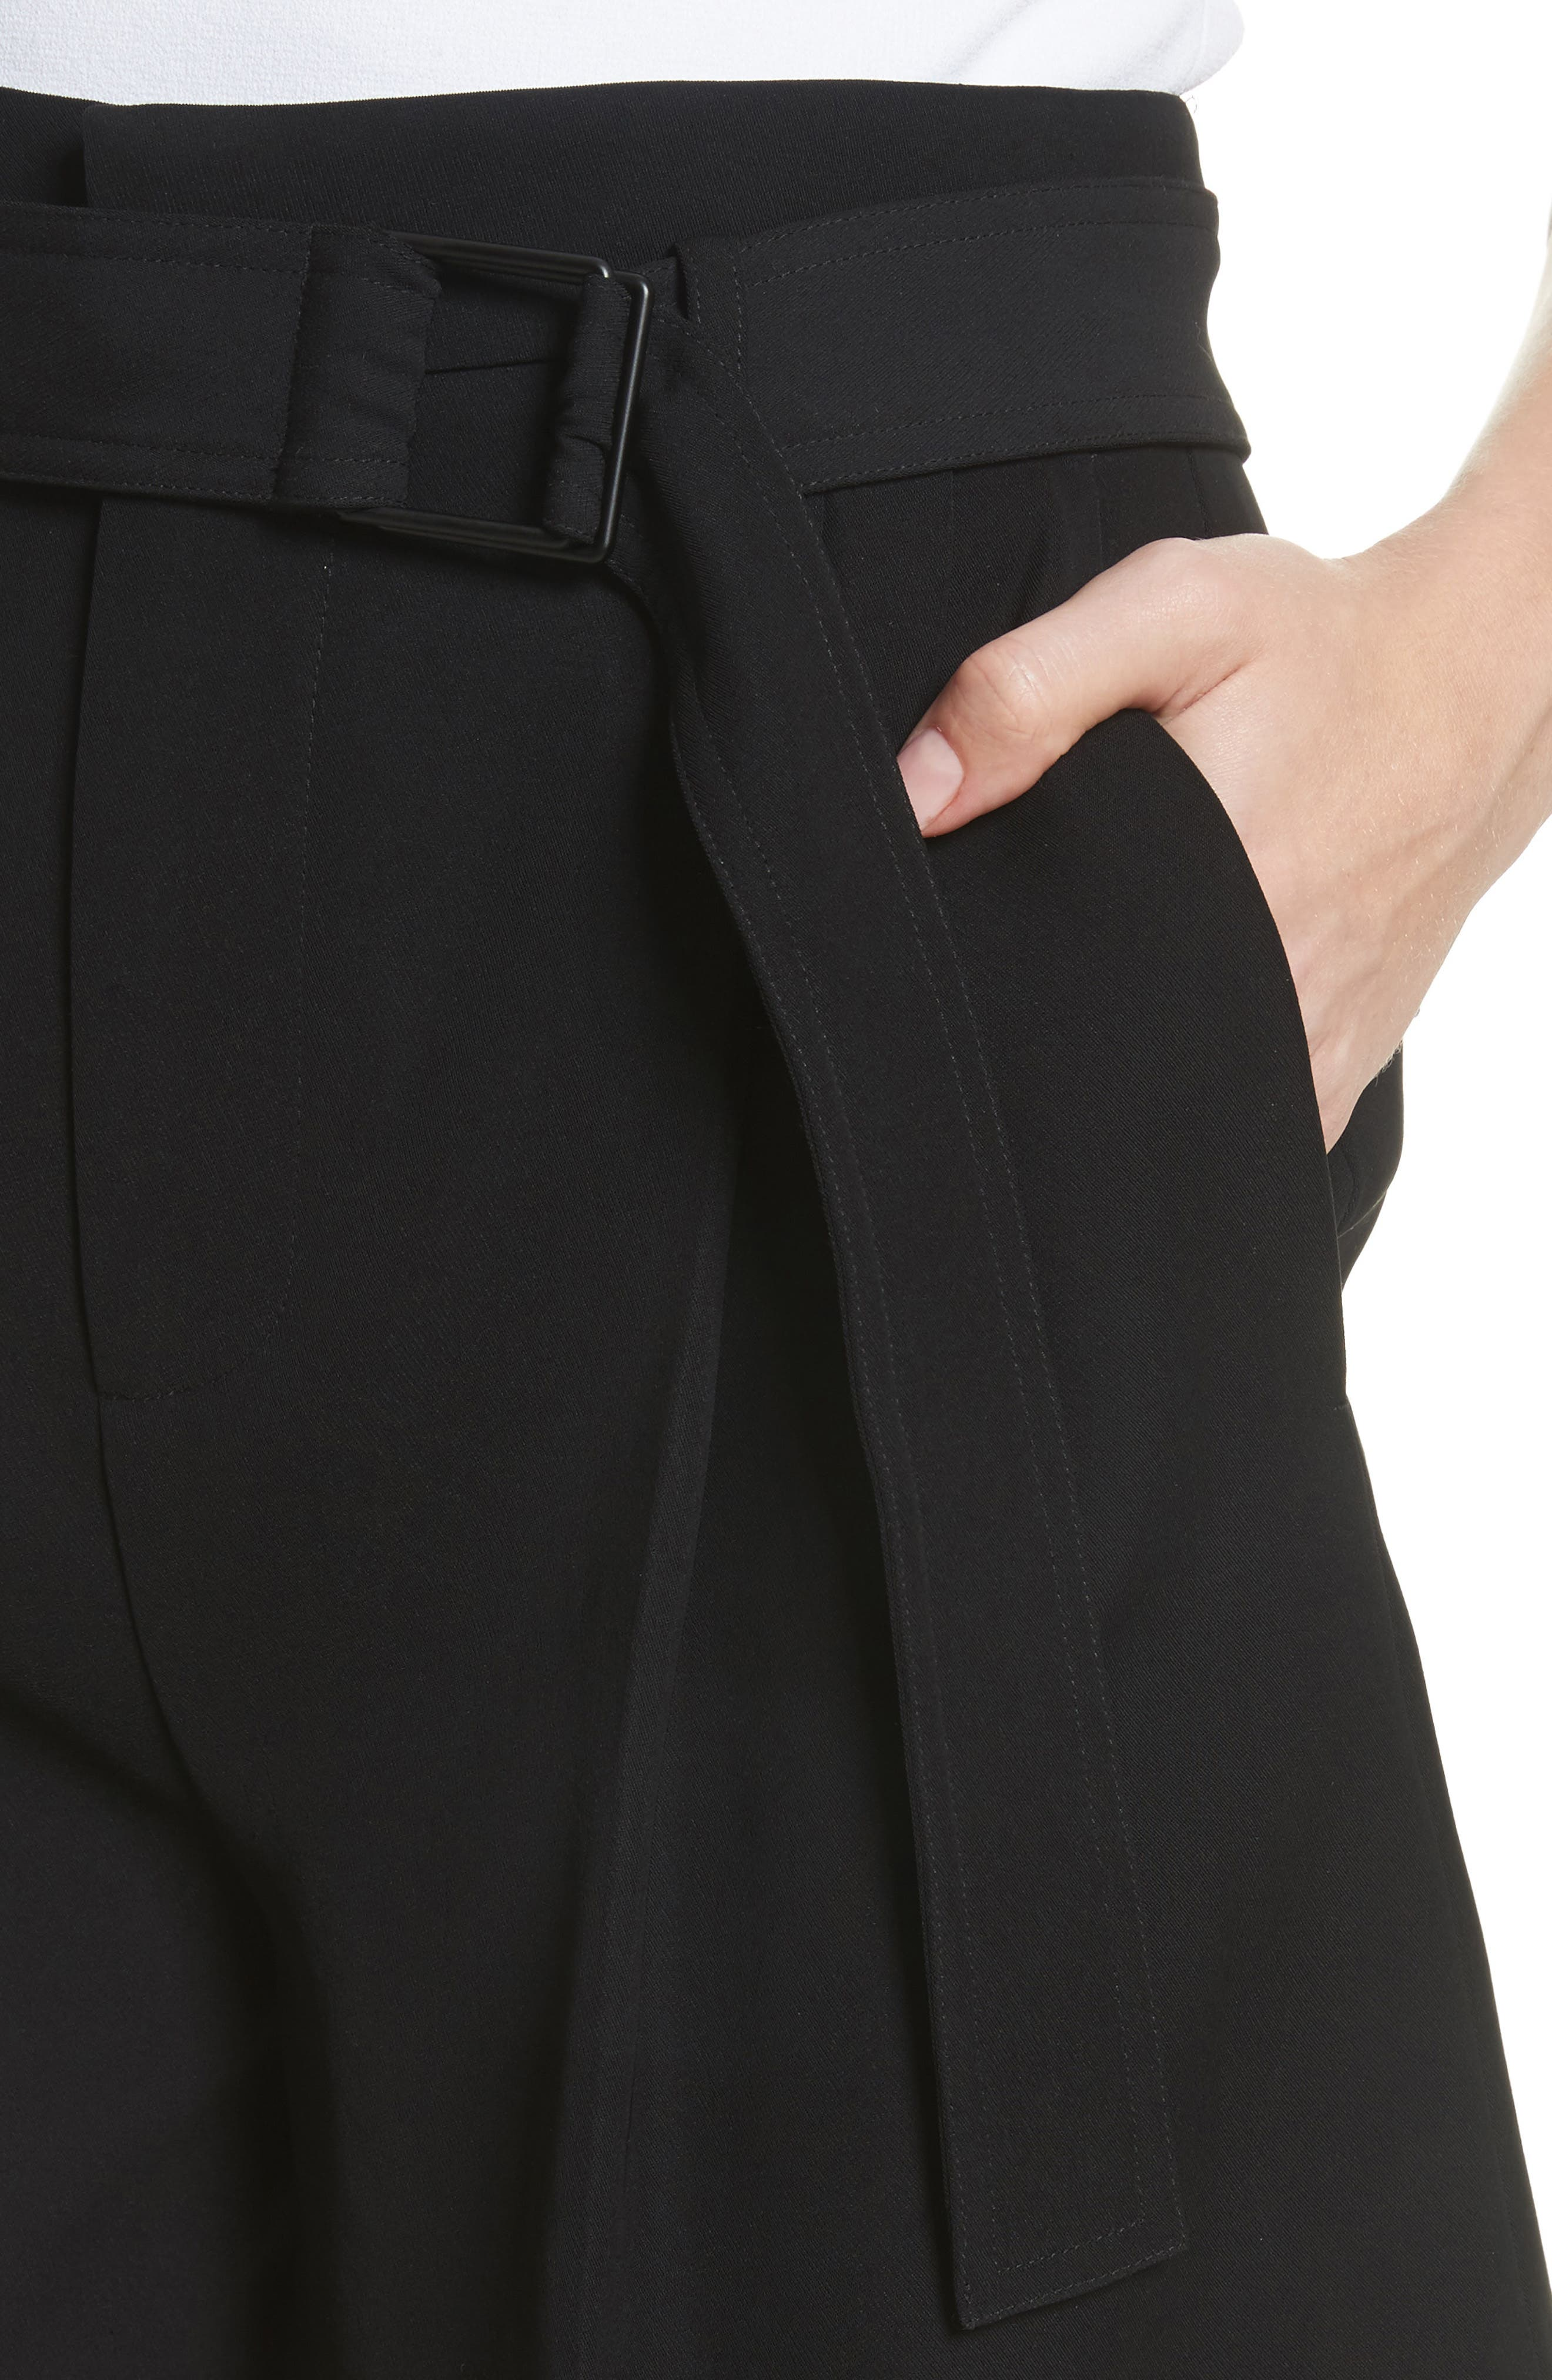 Belted Shorts,                             Alternate thumbnail 4, color,                             Black